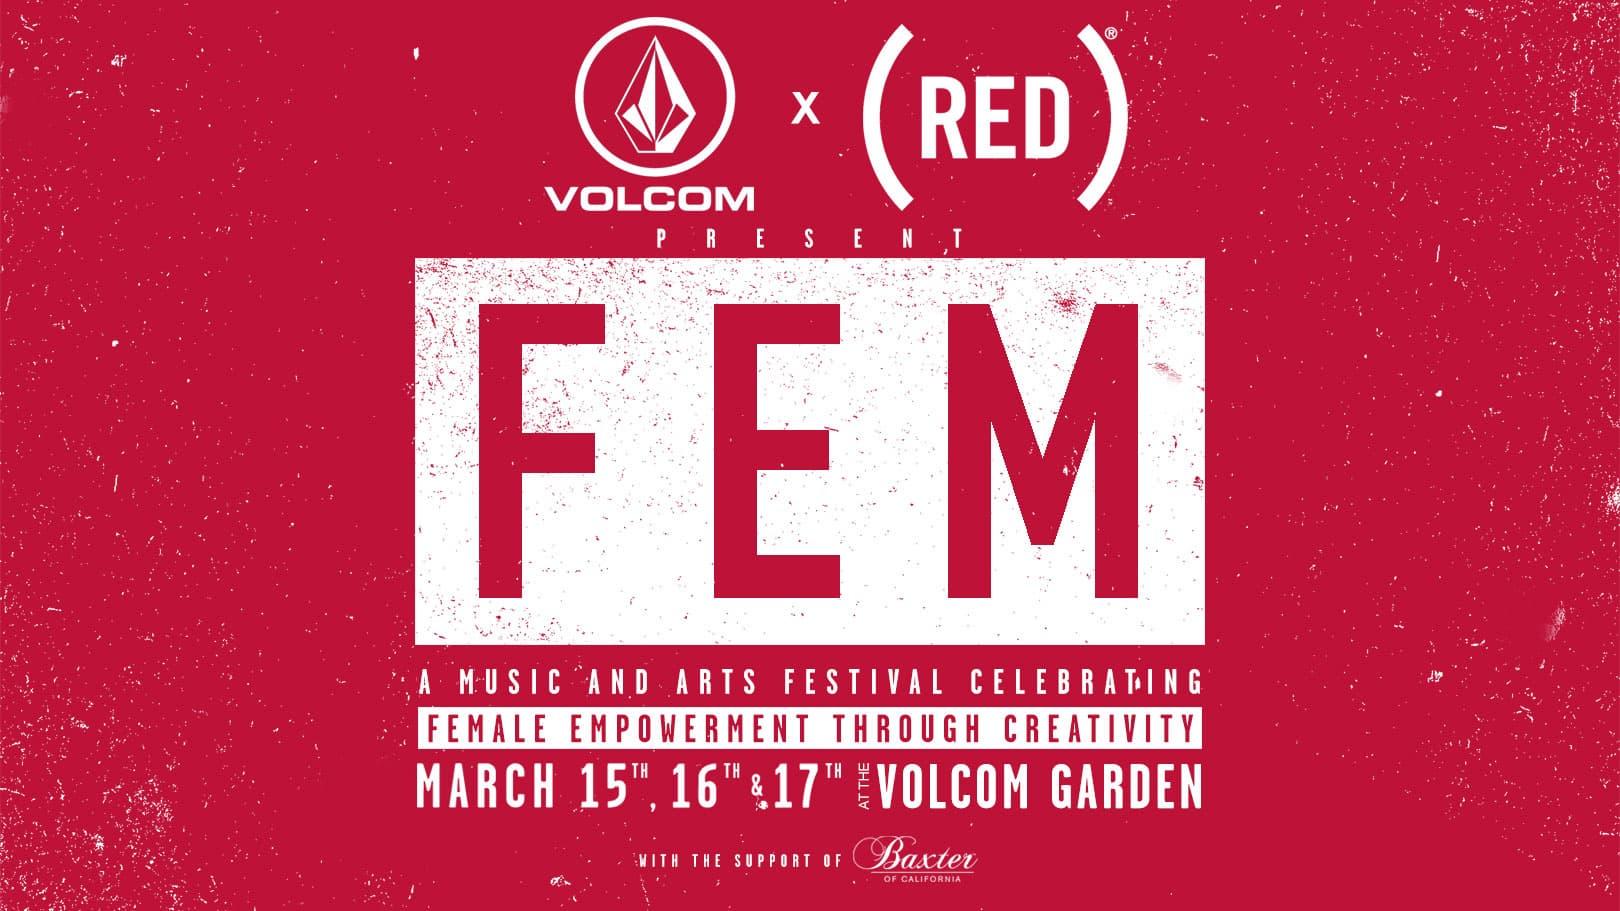 fem-female-empowerment-red-org-volcom-garden_featured-image_1620x911